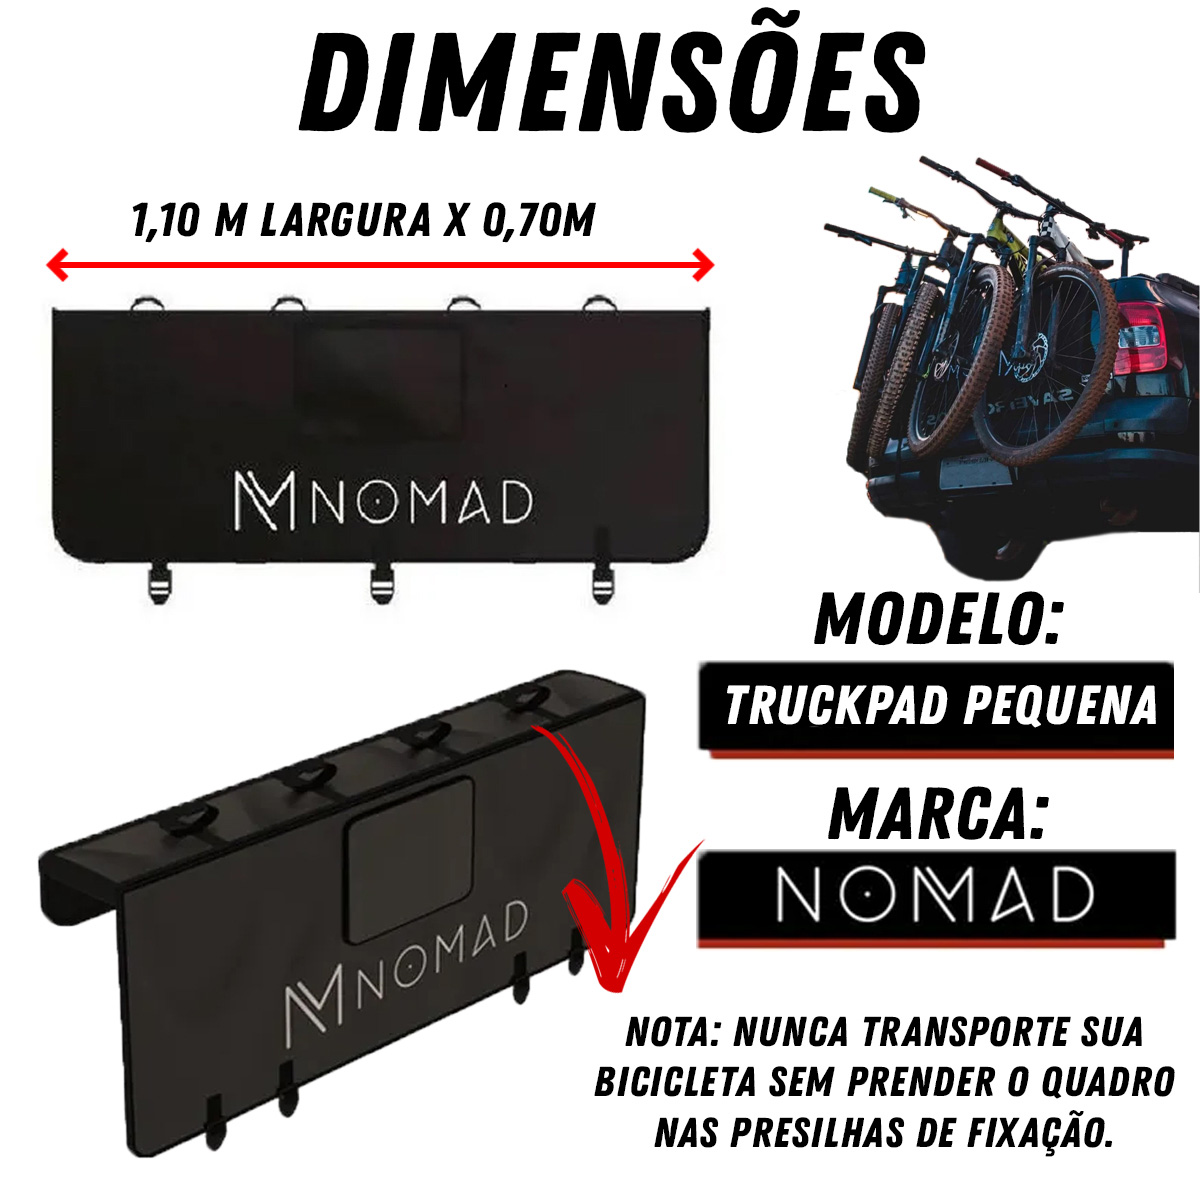 Truckpad Pequeno Nomad Transbike para até 4 Bicicletas Poliparts